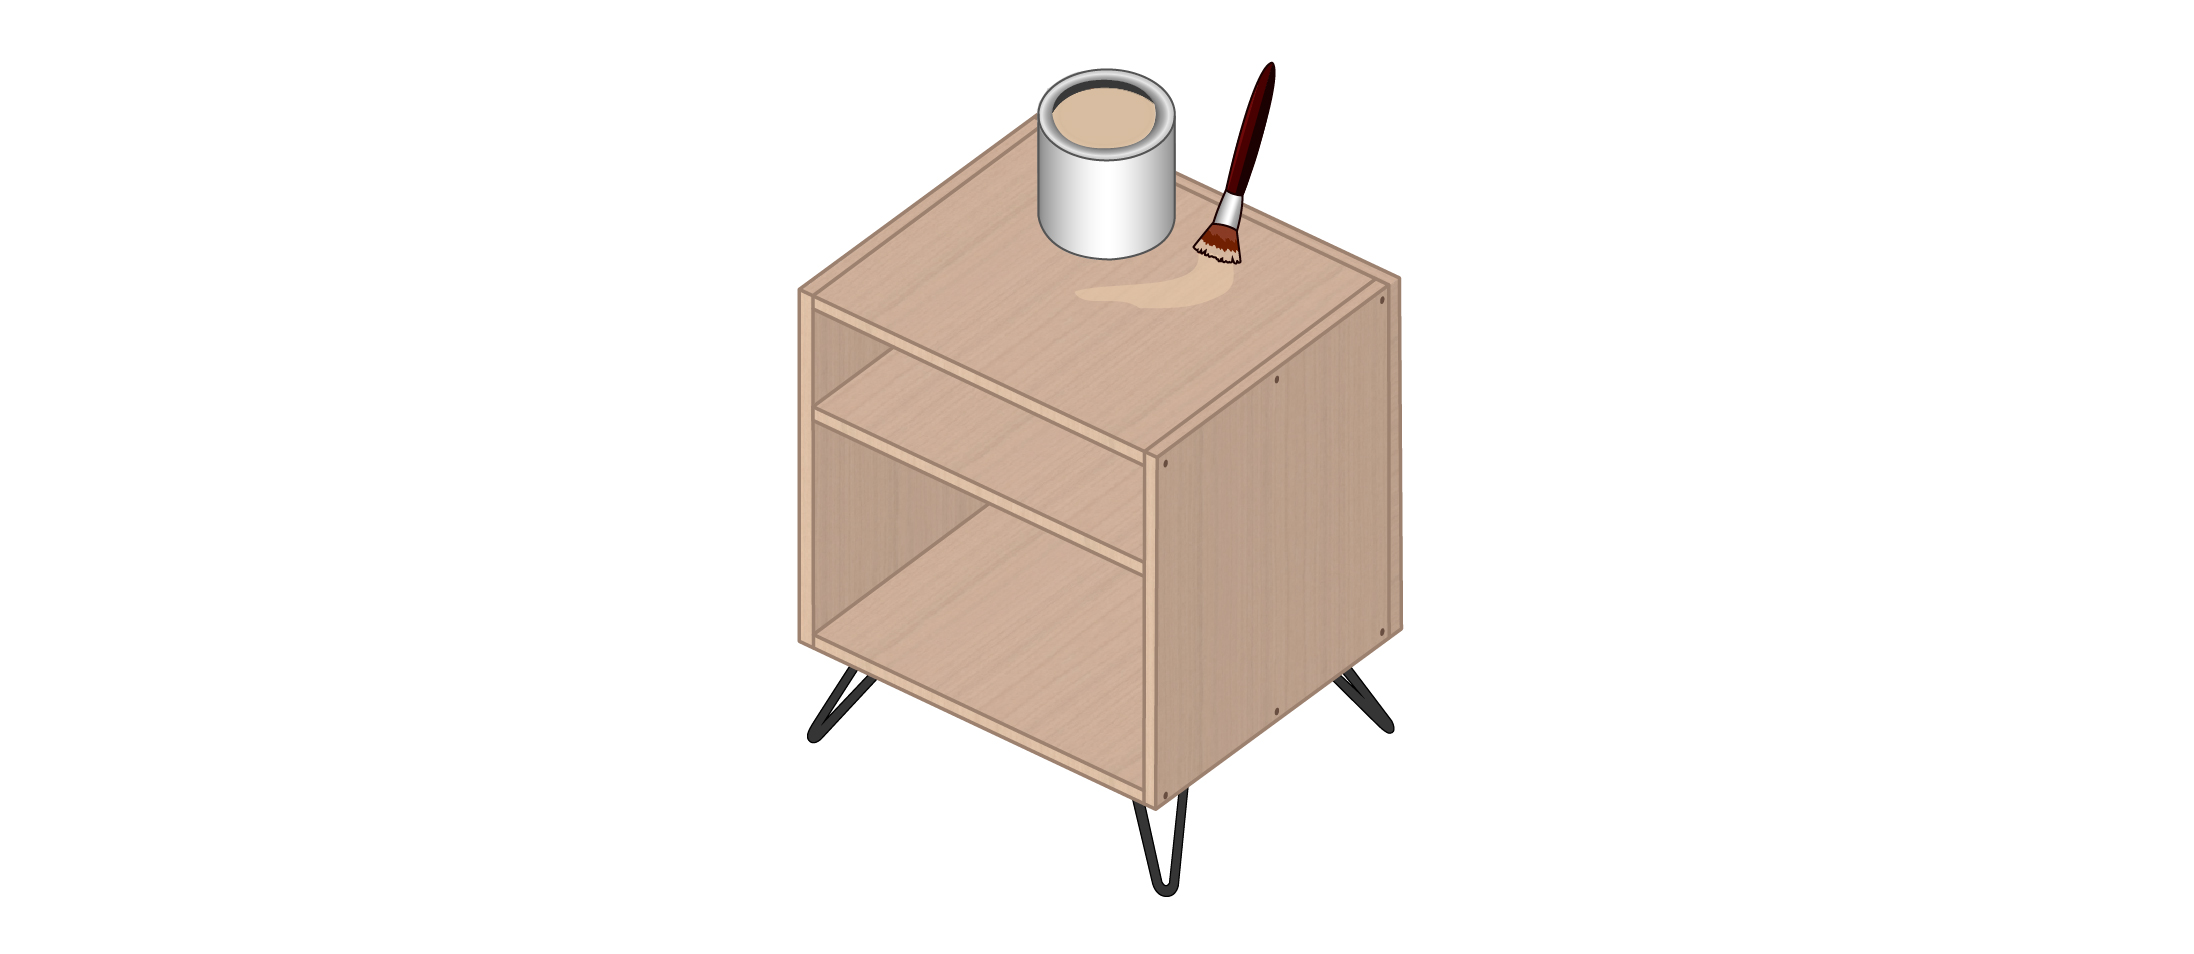 meuble vinyle DIY étape 8